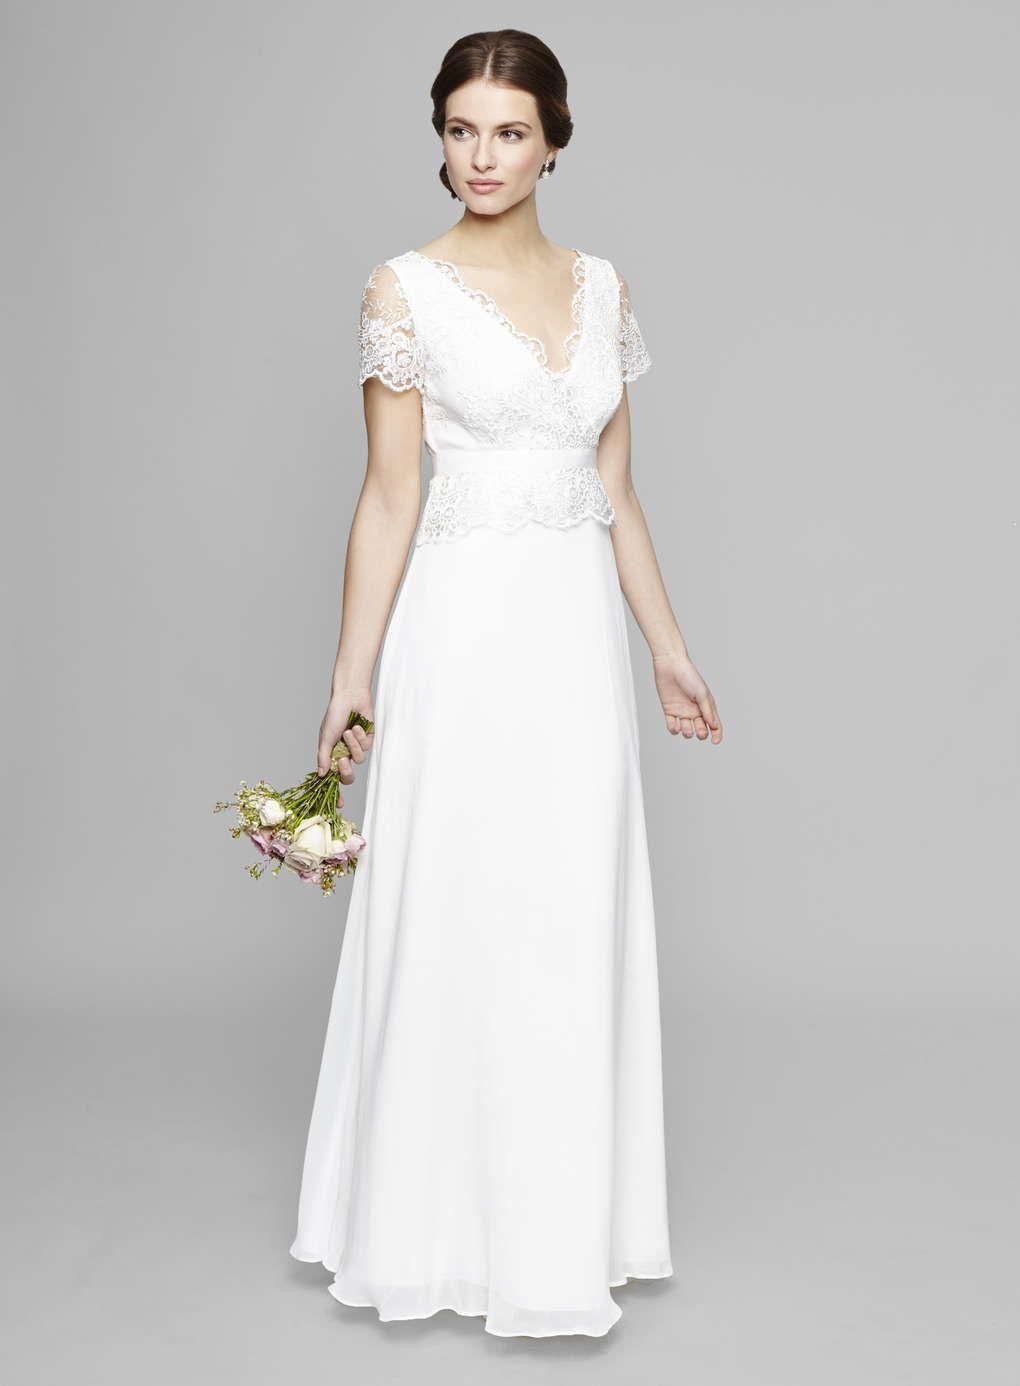 Bhs Ivory Bella Vintage Wedding Dresses Keyhole Wedding Dress 2nd Wedding Dresses